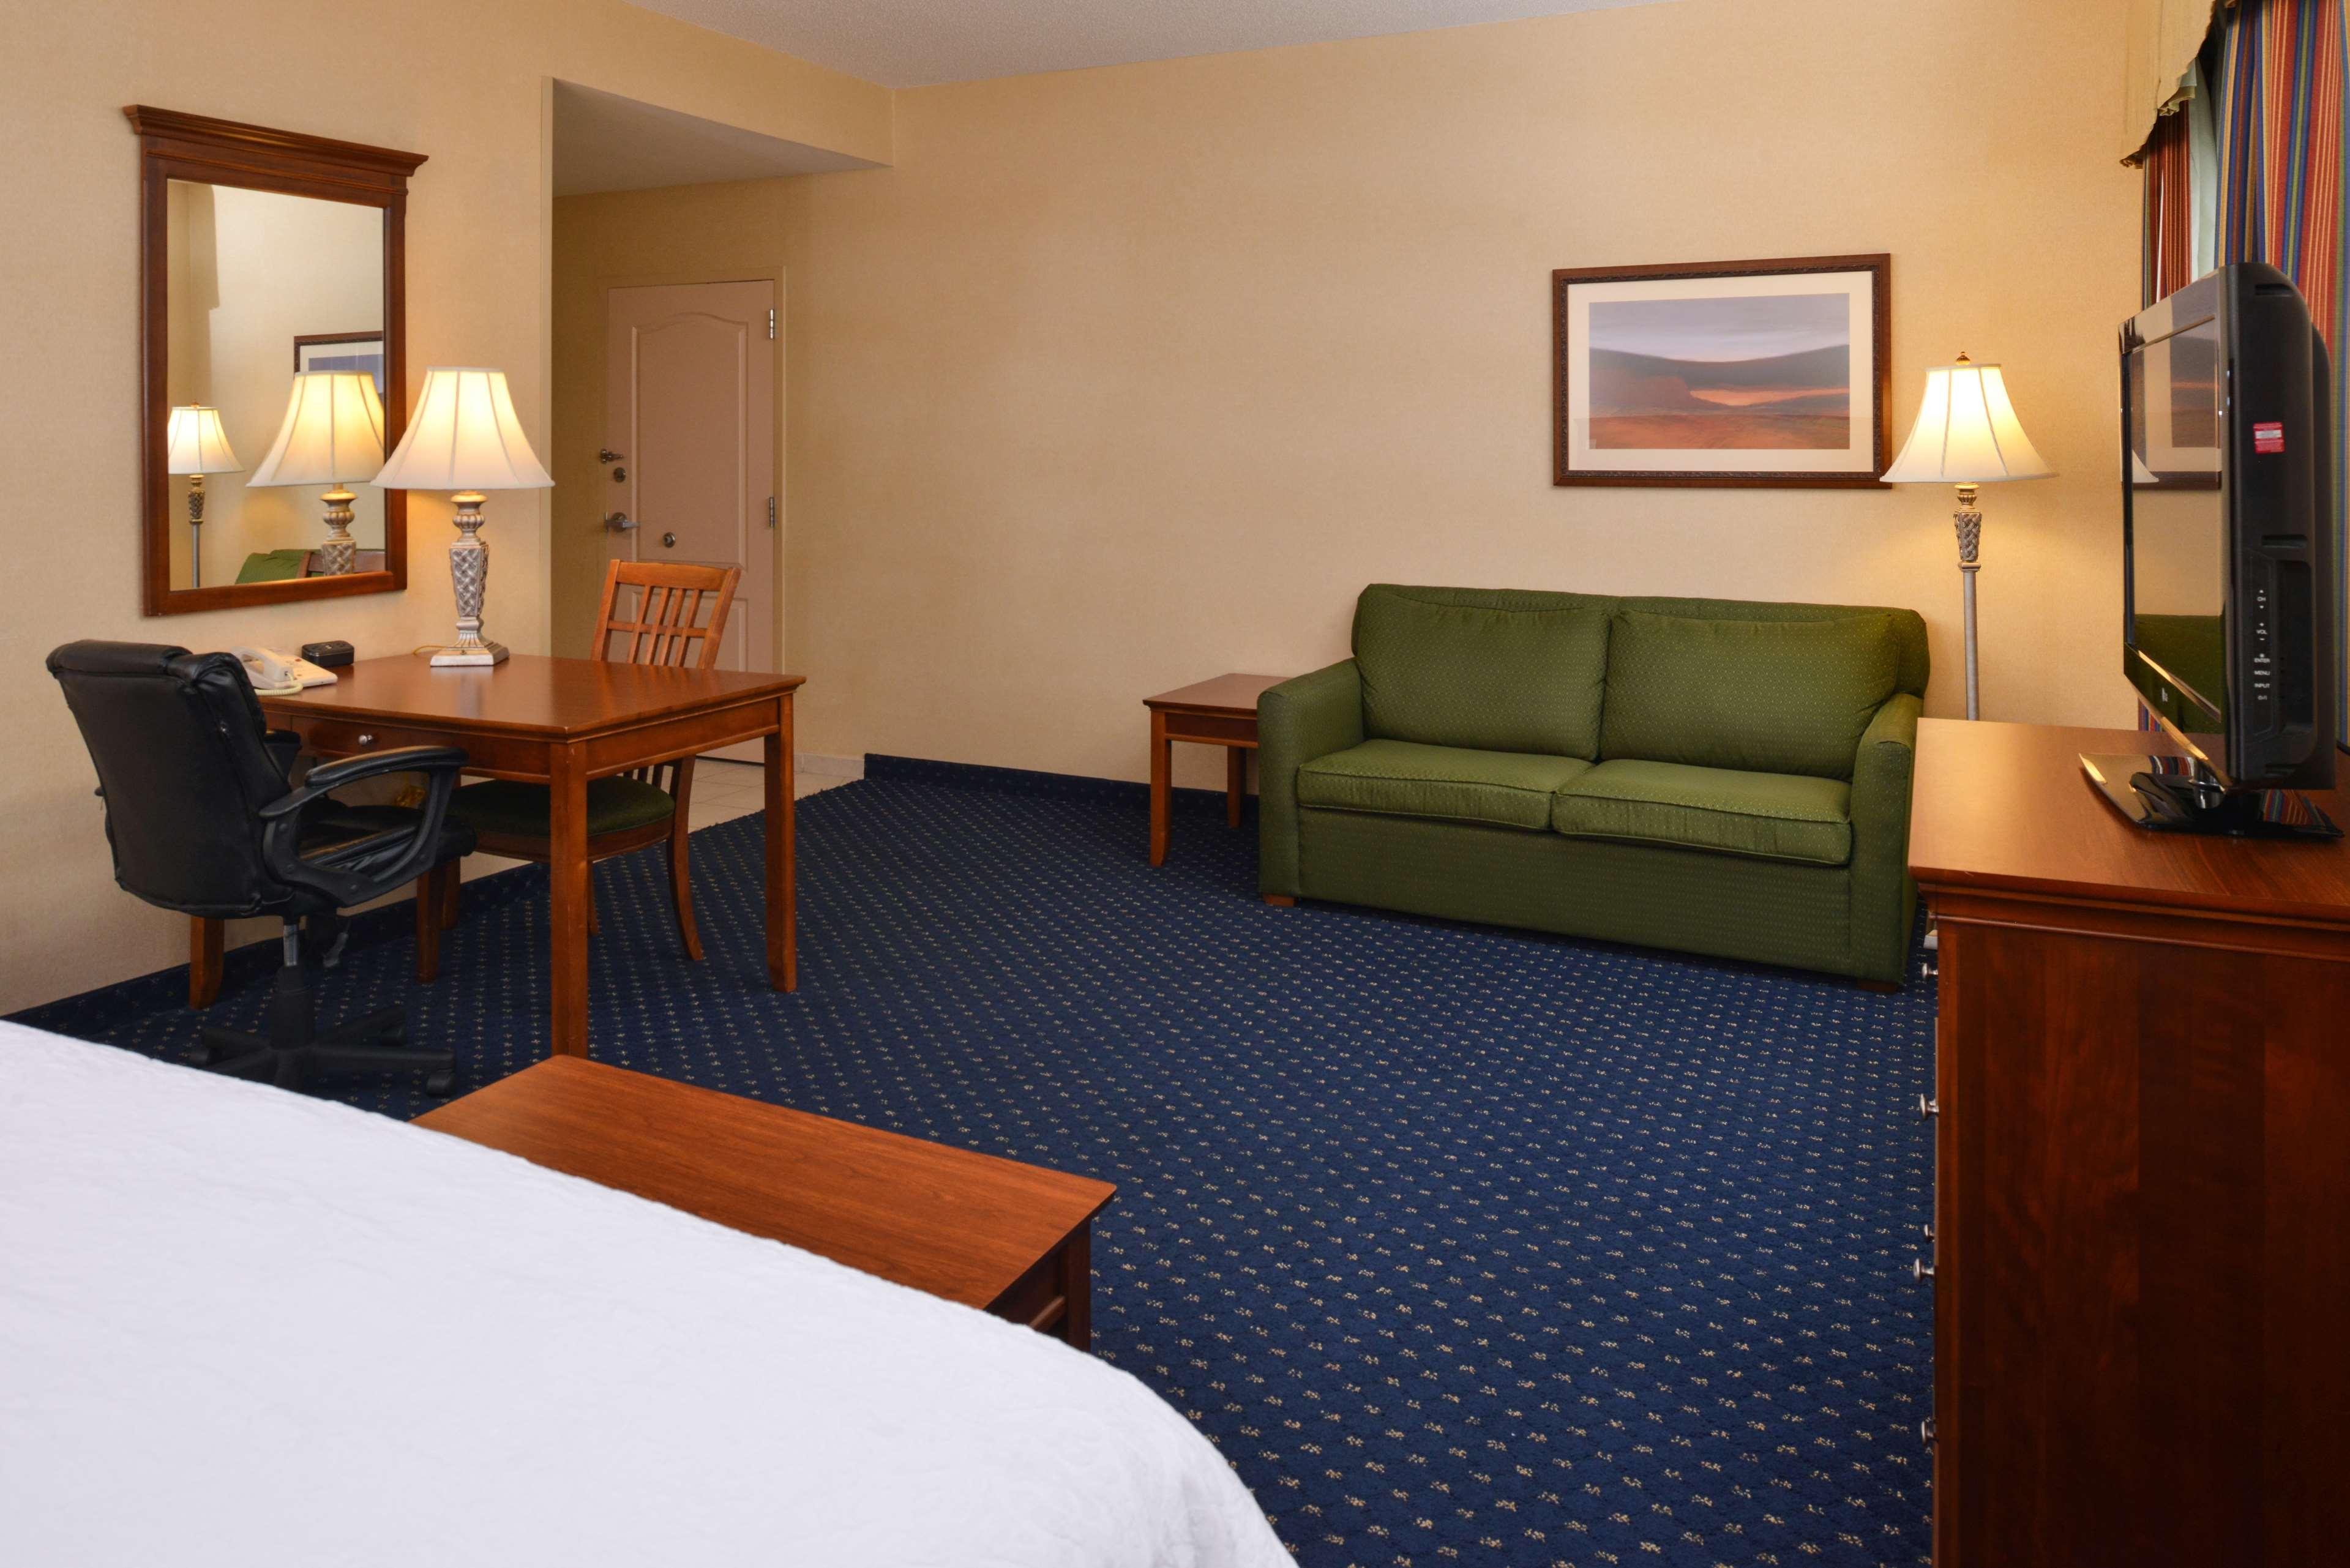 Hampton Inn & Suites Fredericksburg South image 26